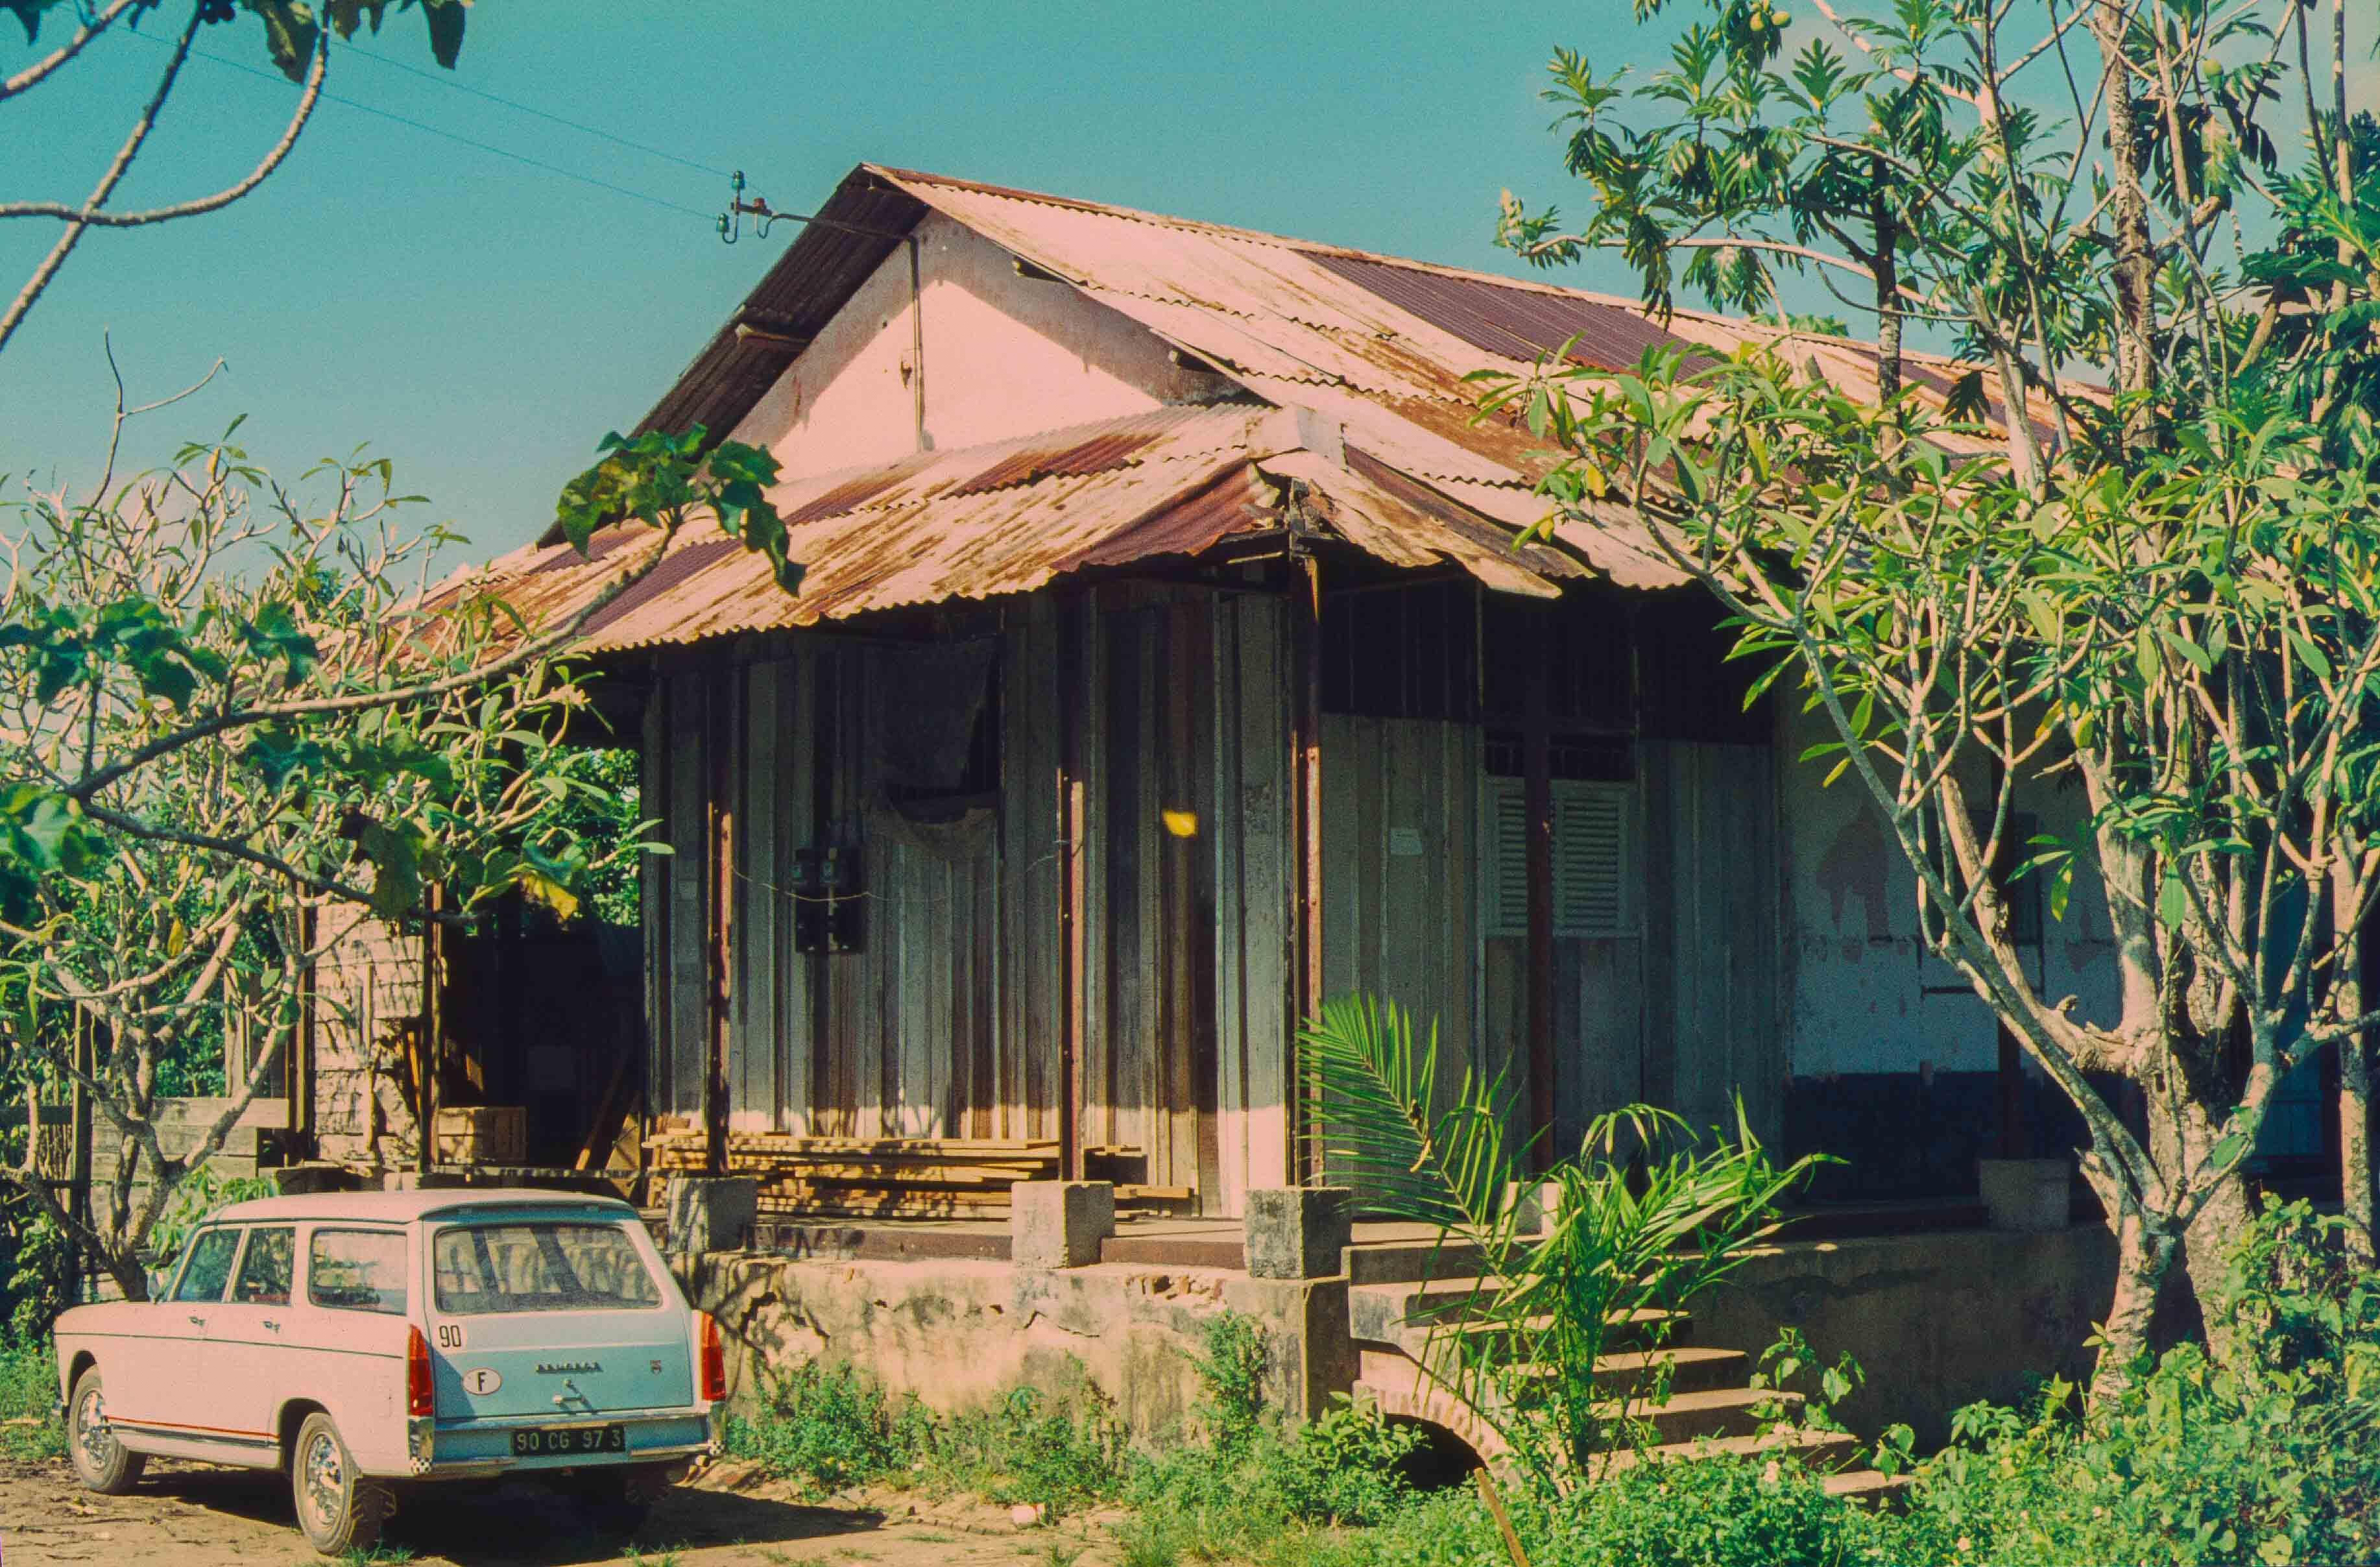 434. Suriname